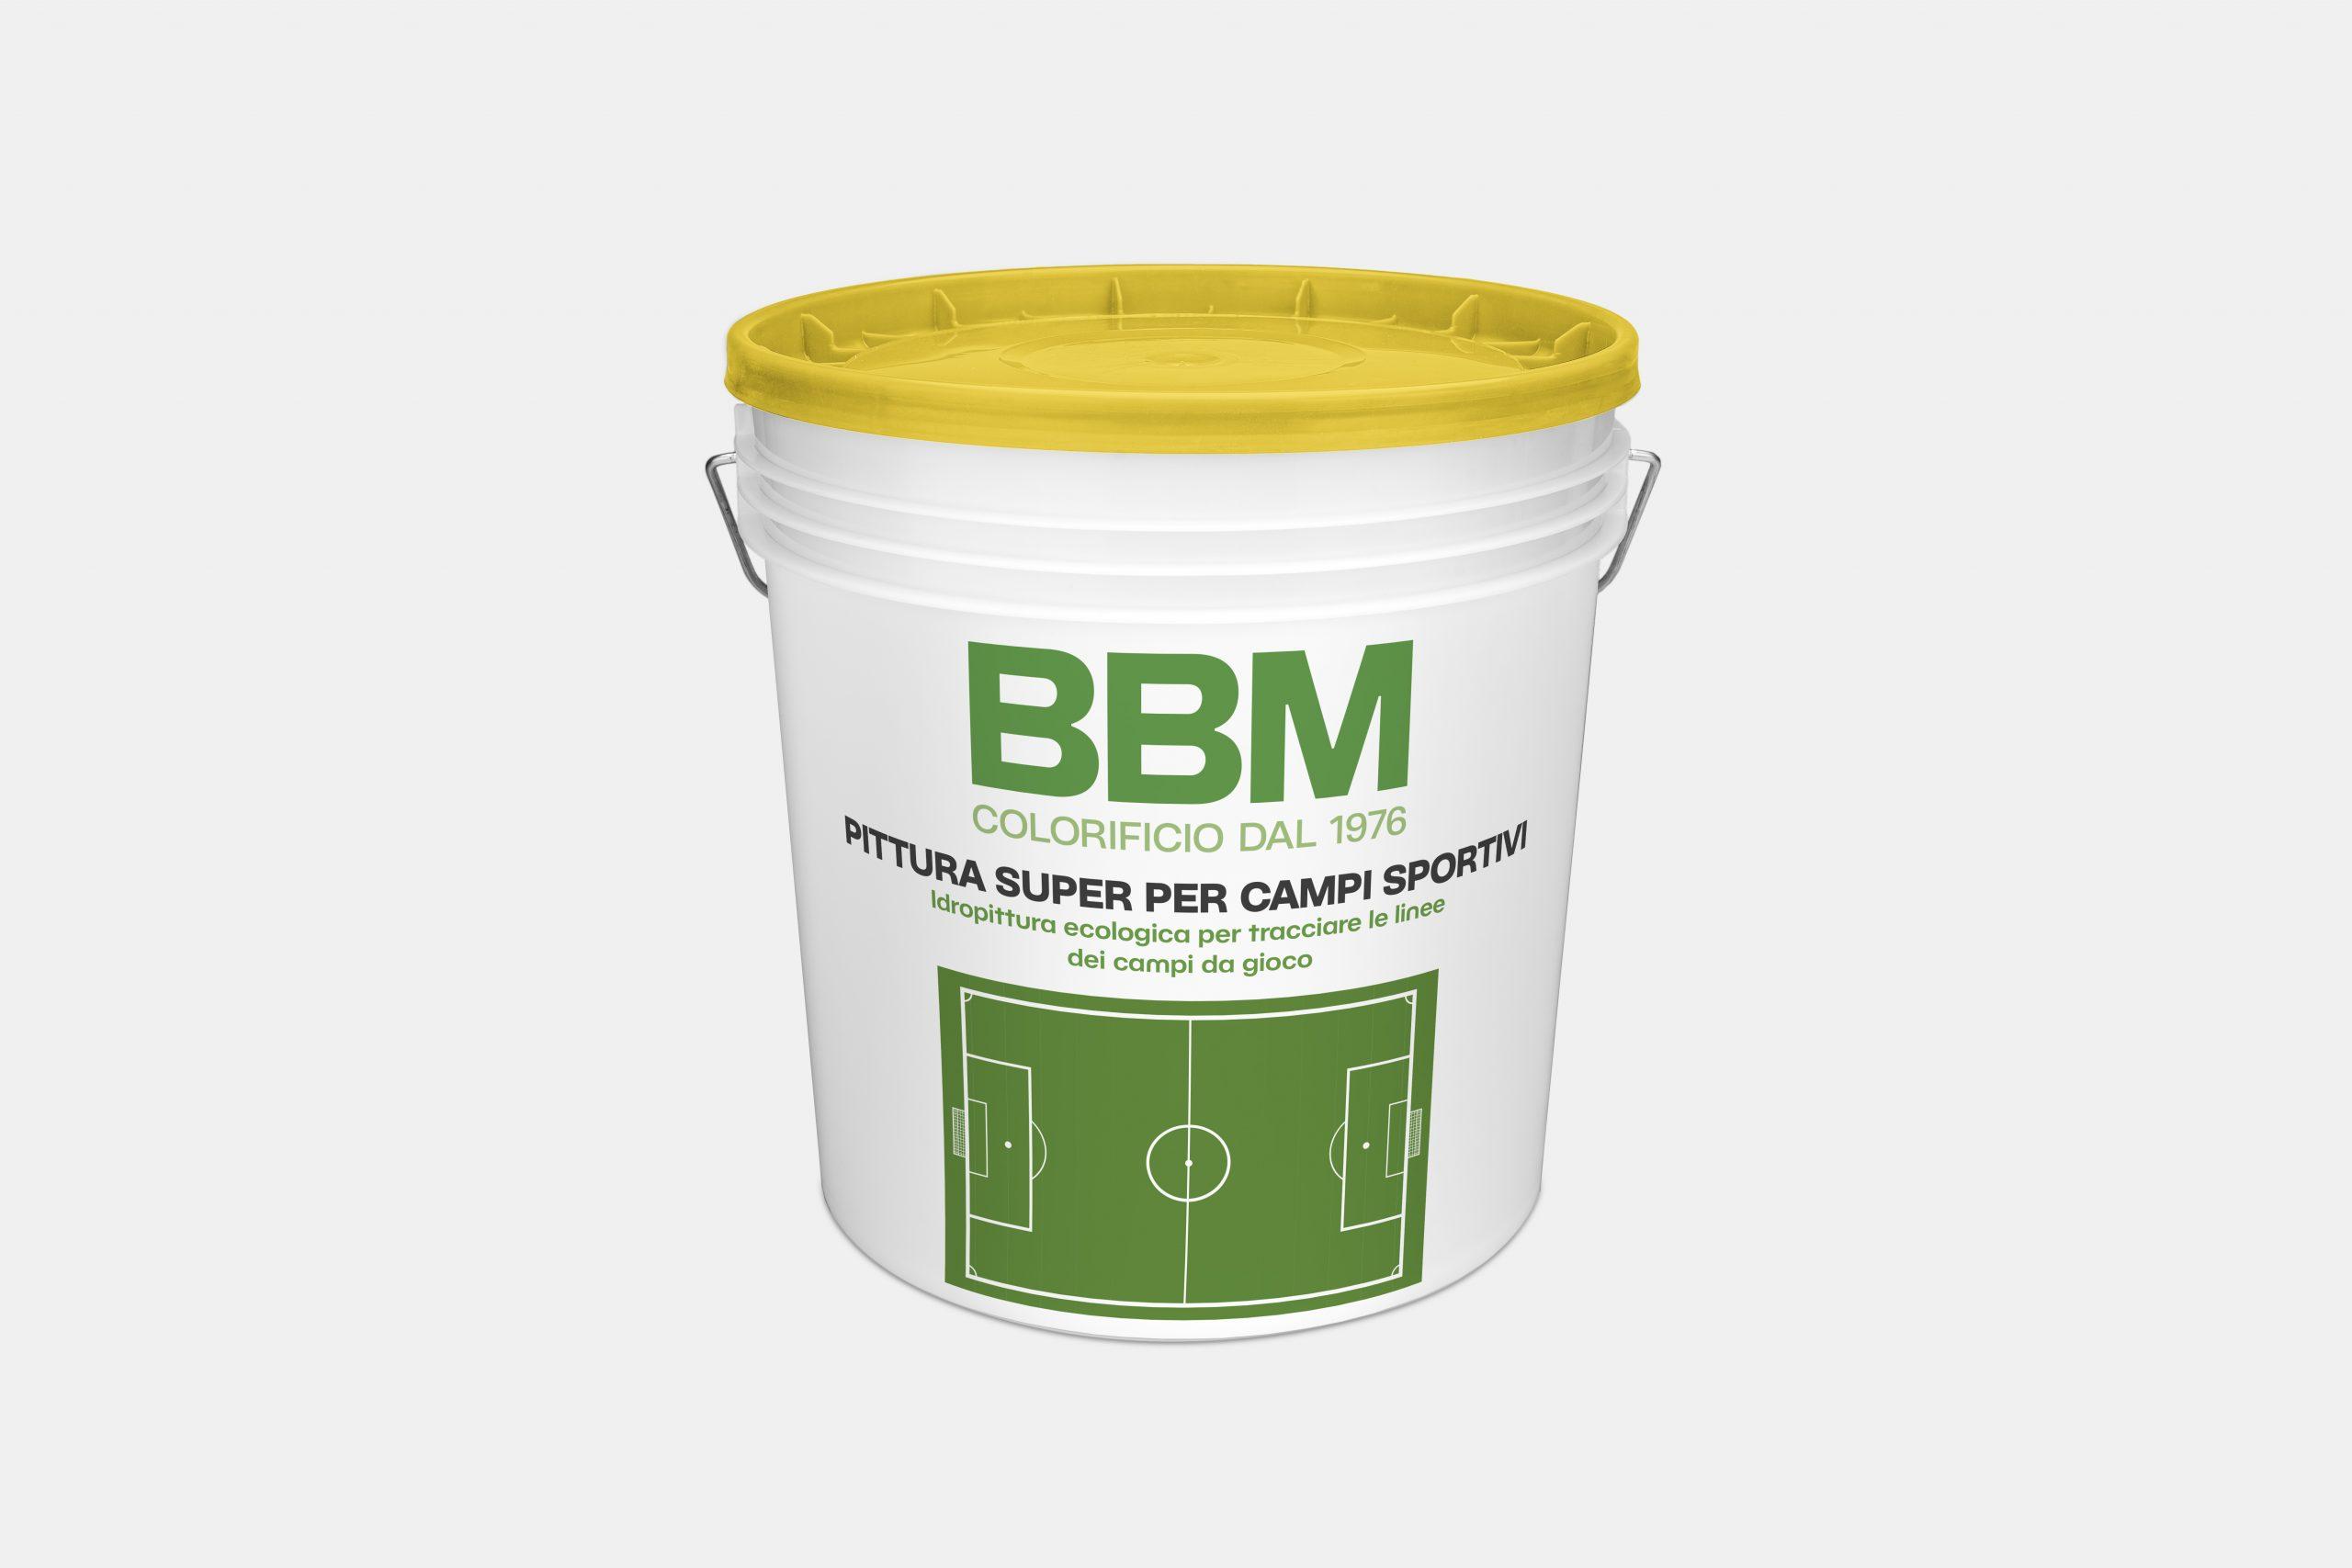 https://bbm-colorificio.it/wp-content/uploads/2021/08/Pittura-SUPER-per-campi-sportivi-scaled.jpg